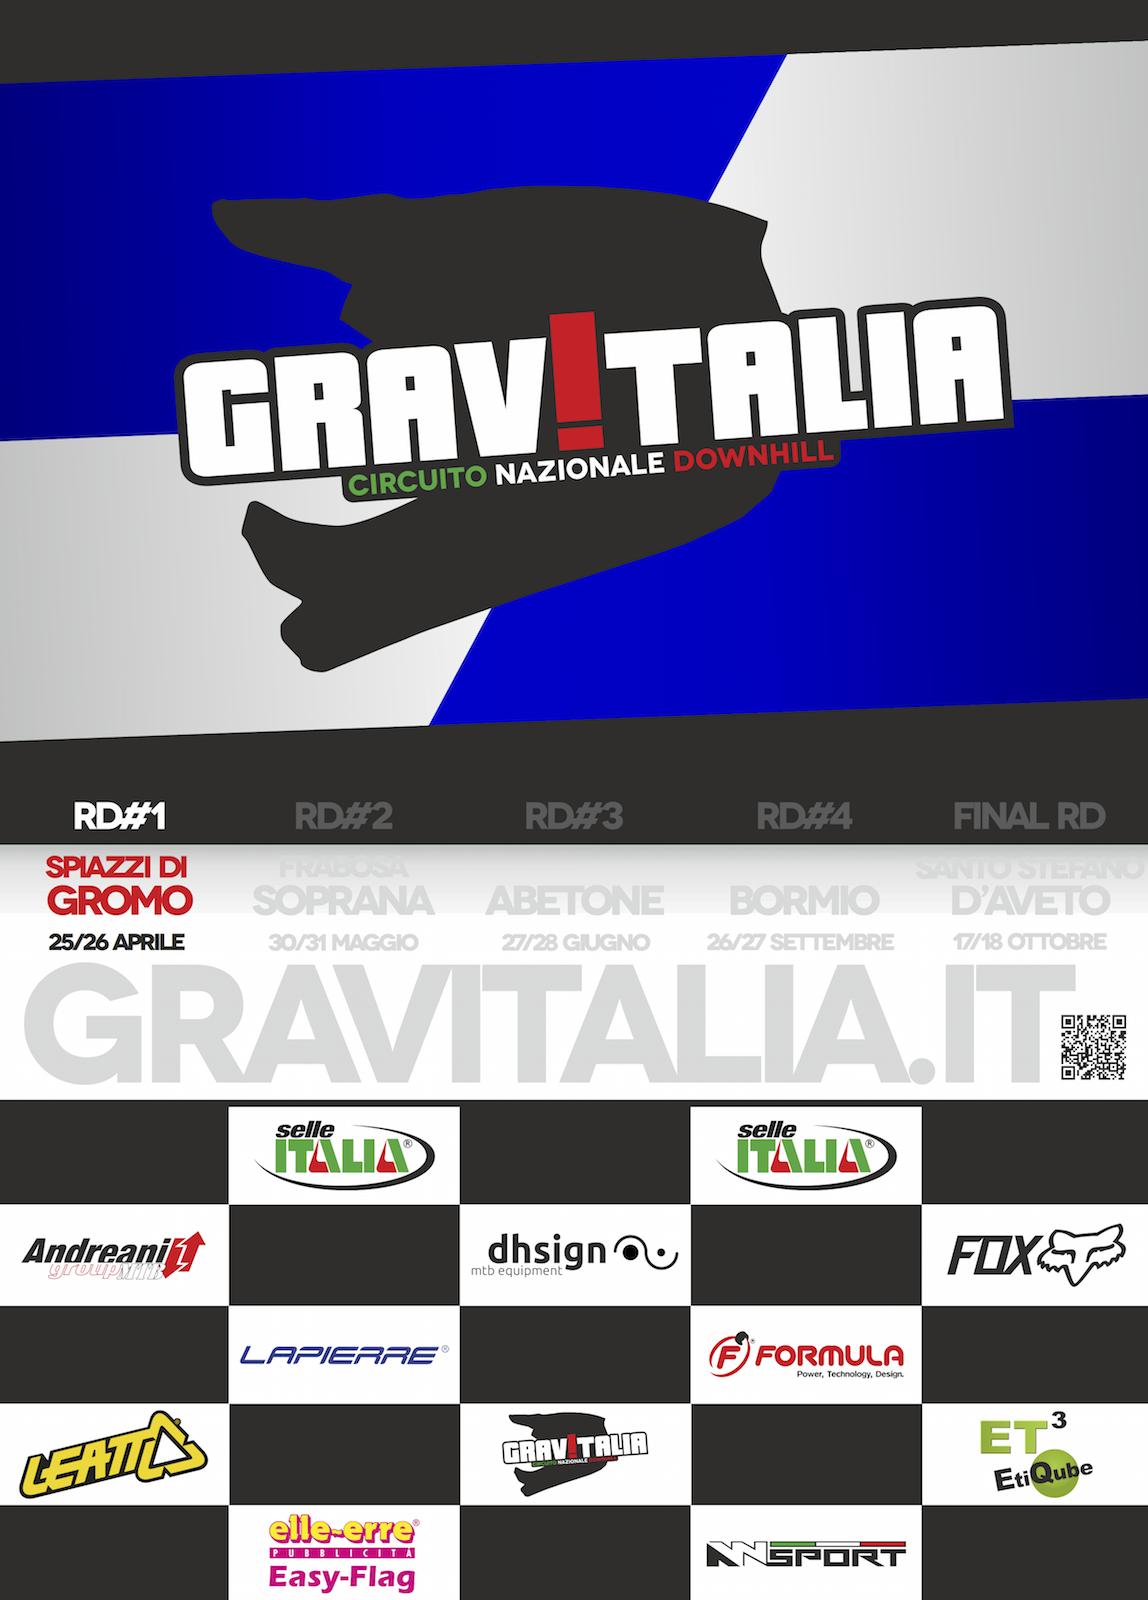 locandina gravitalia spiazzi 2015